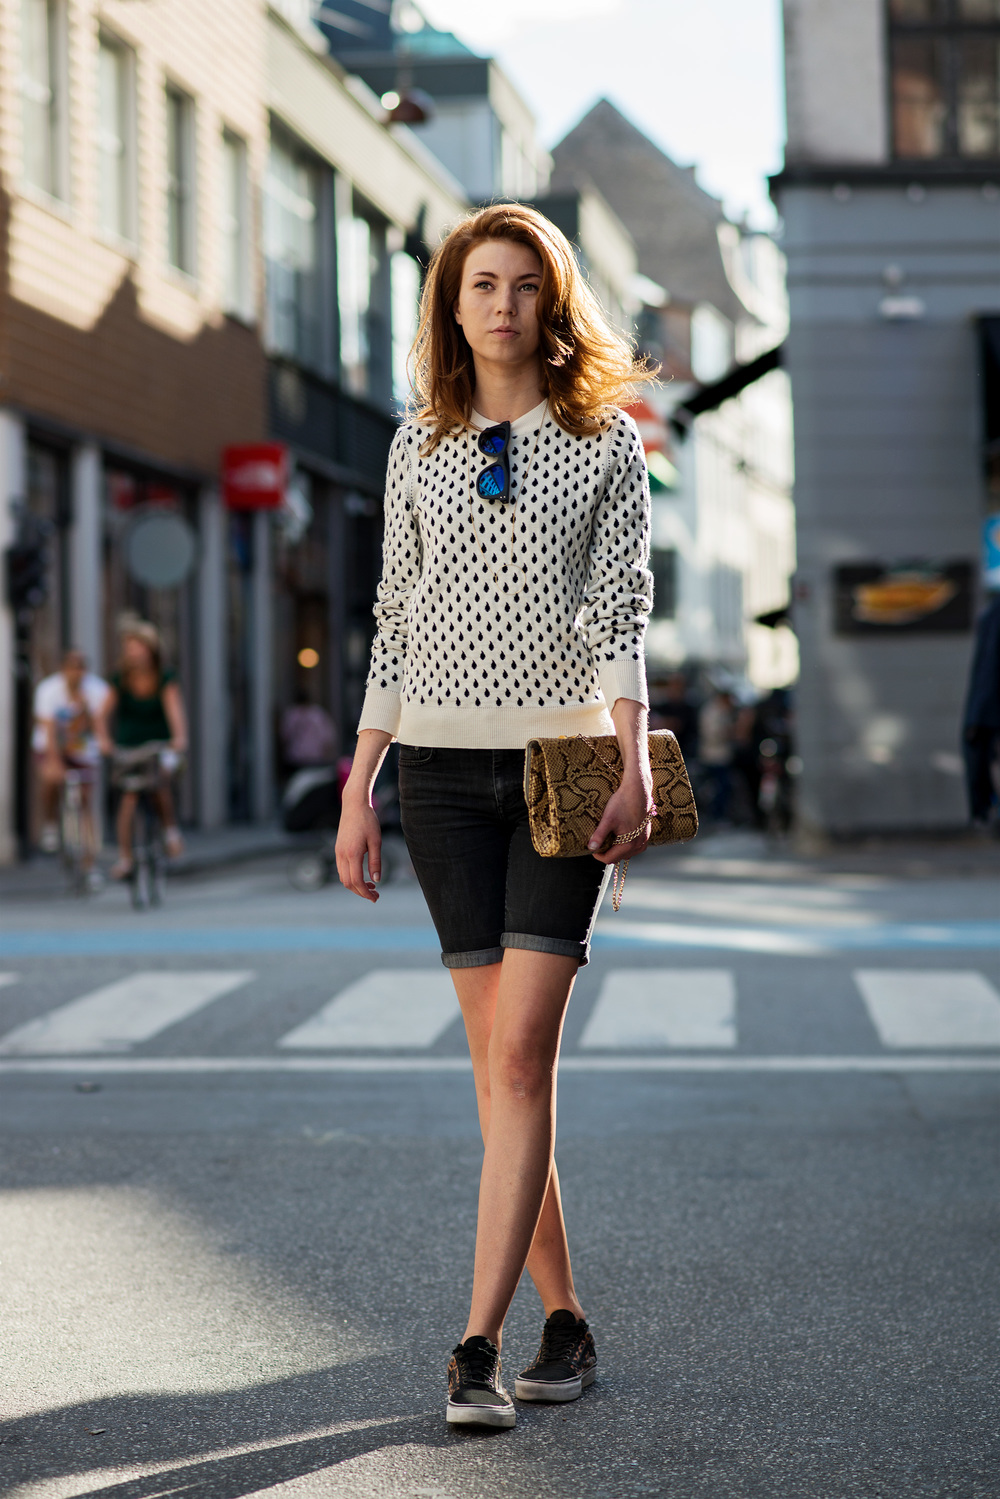 Image Result For Scandinavian Street Style Summer